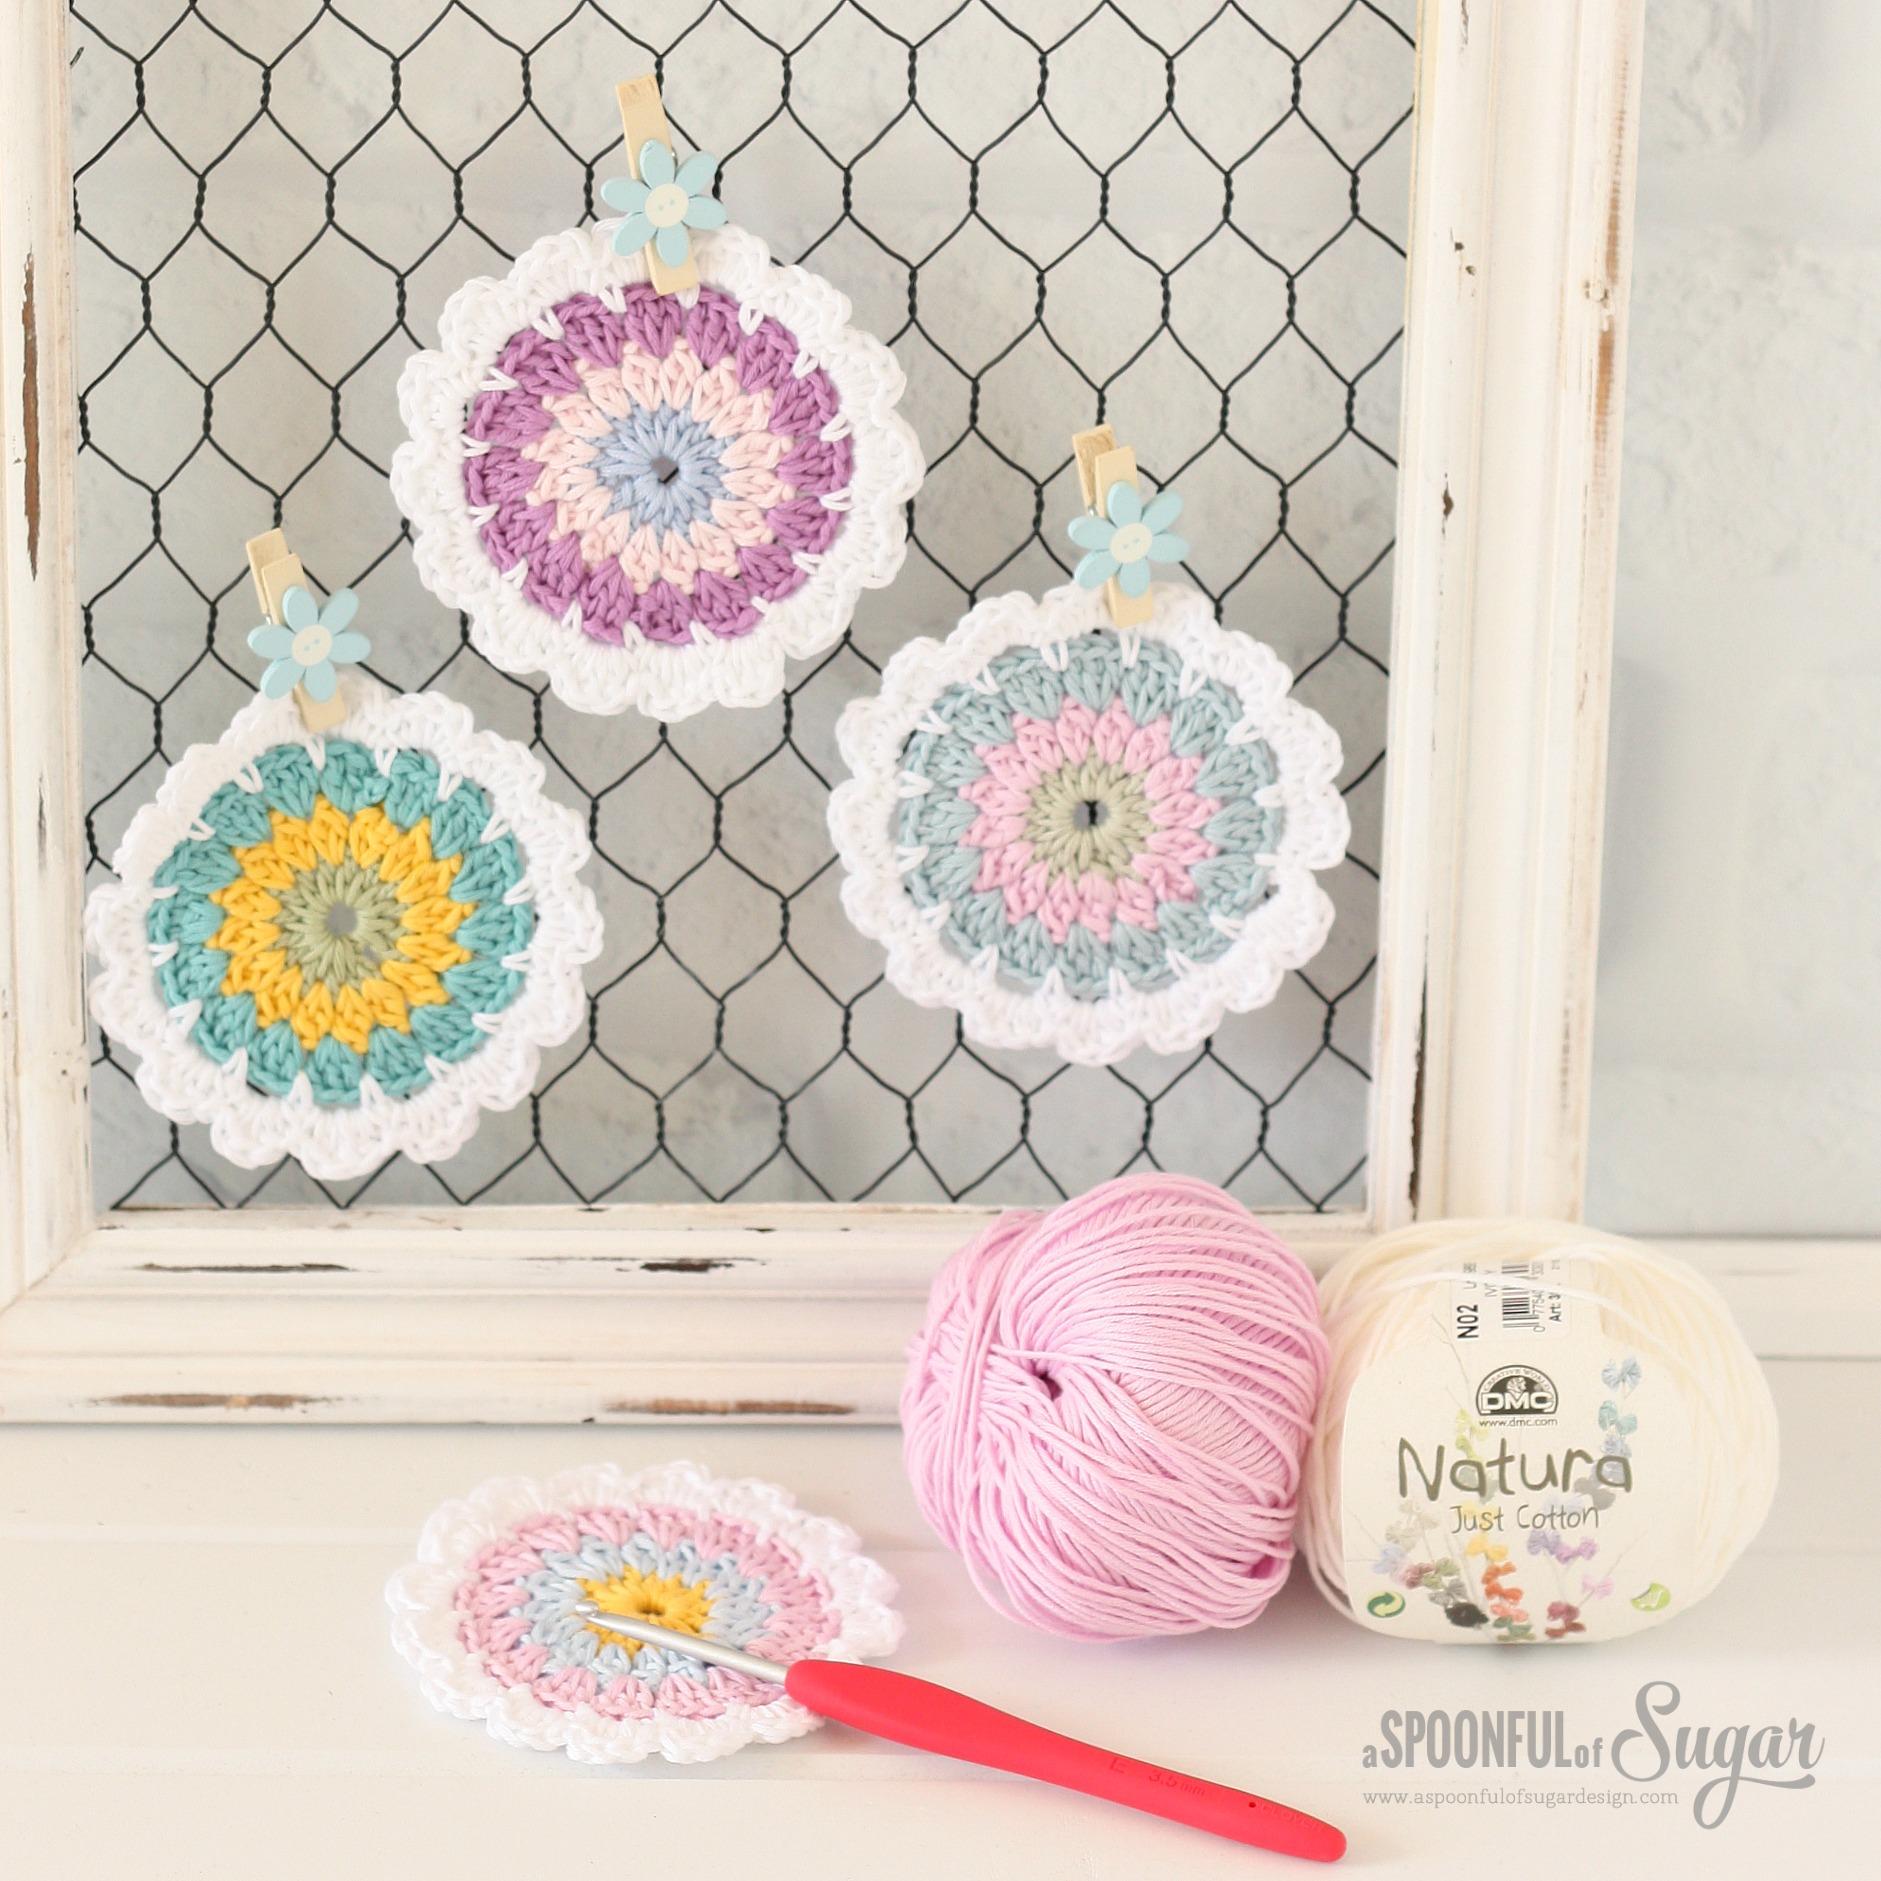 Flower Coaster Pattern - A Spoonful of Sugar